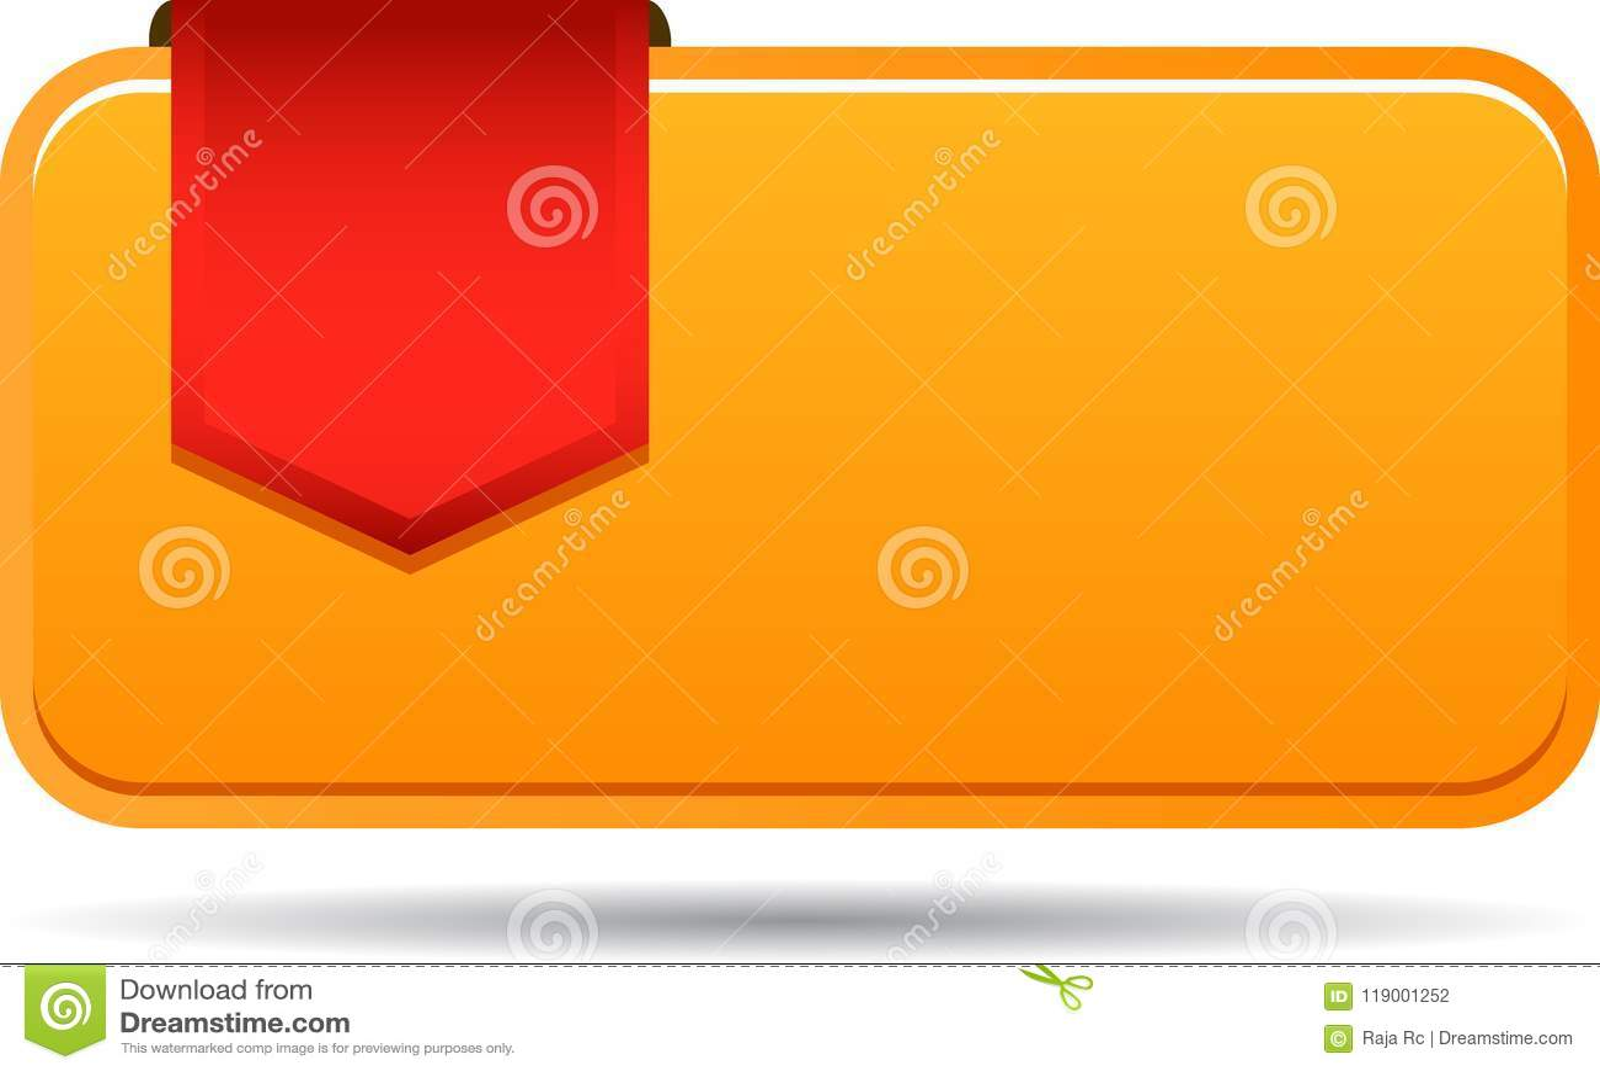 Blank sales tag with ribbon